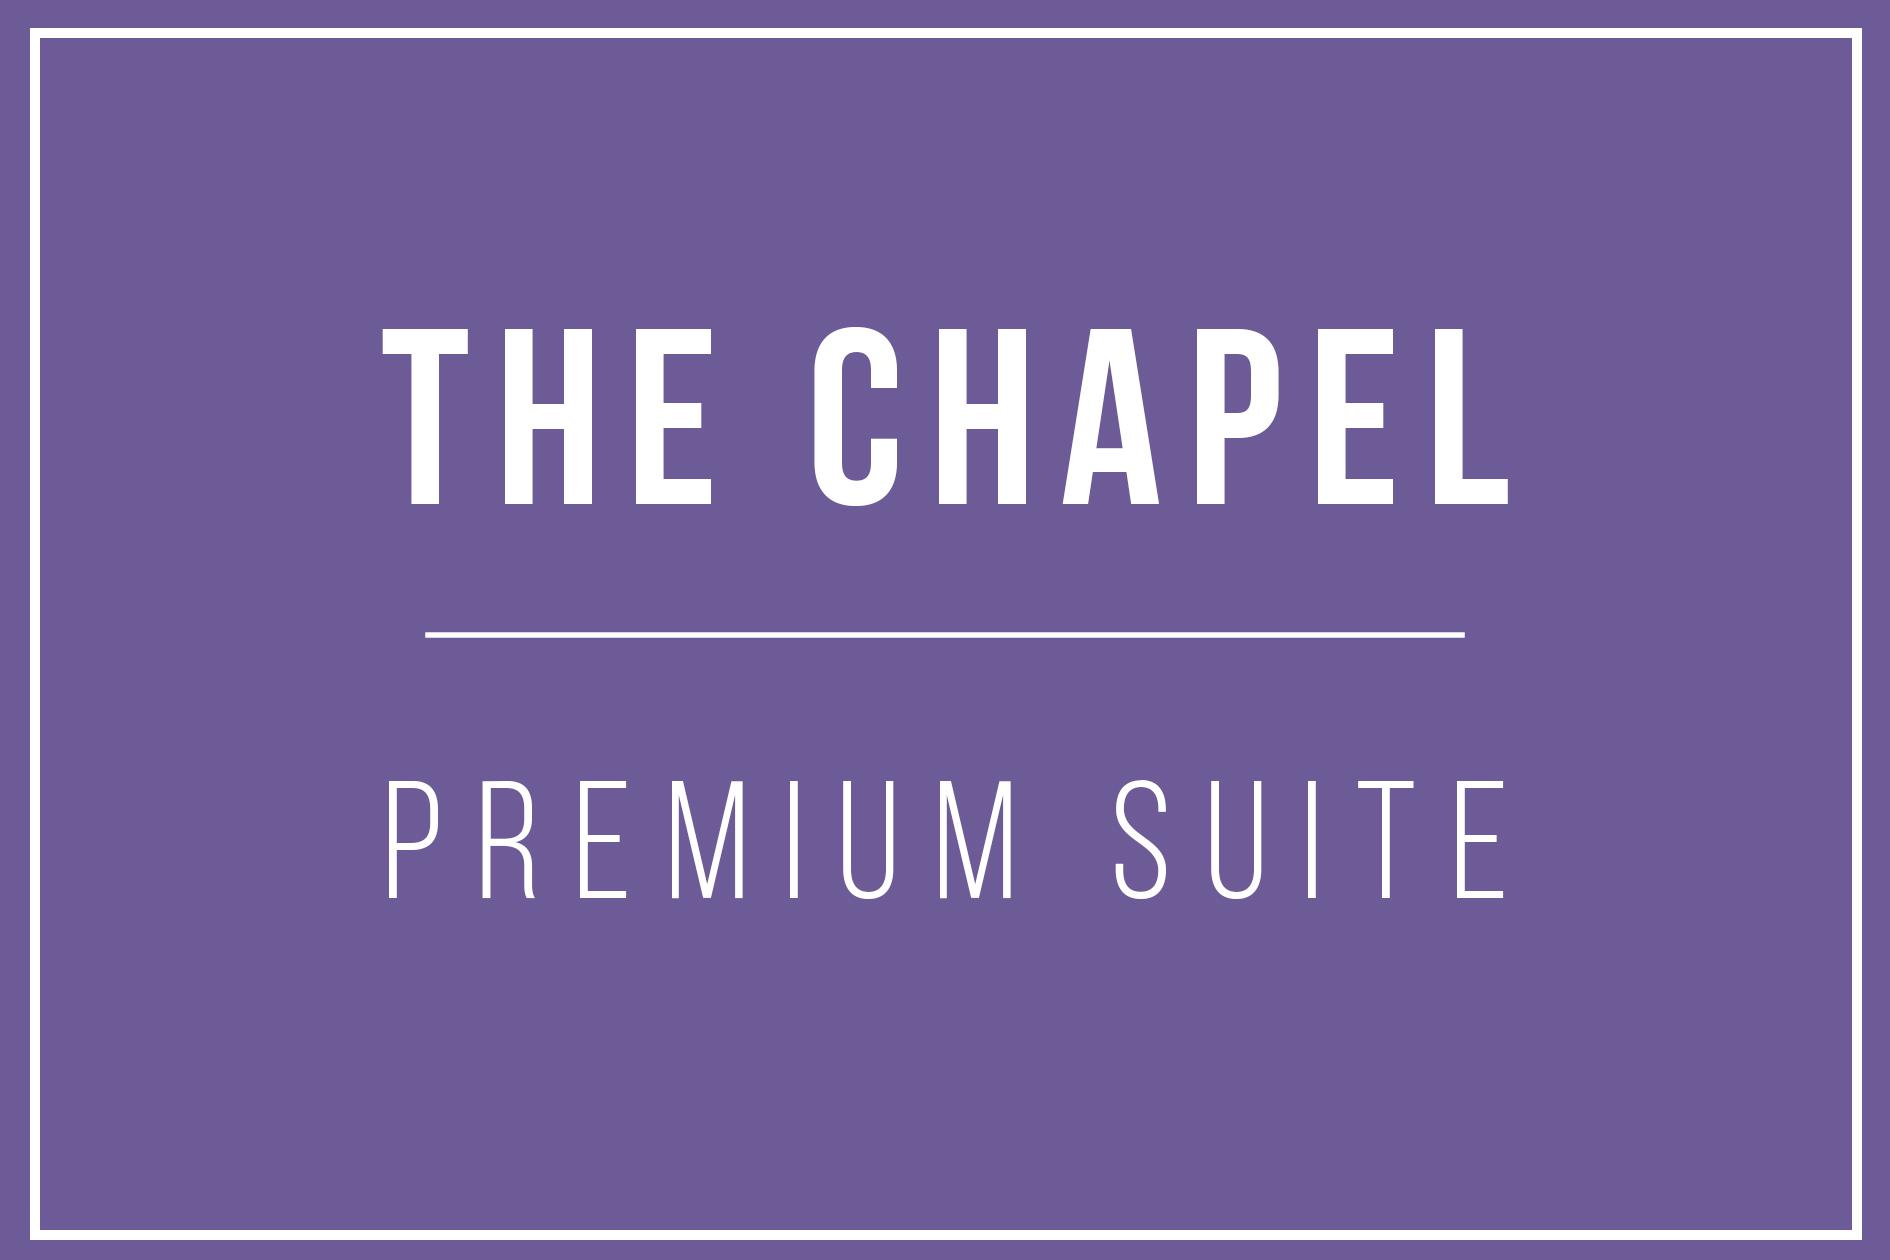 aya-kapadokya-chapel-premium-suite-room-header-0001